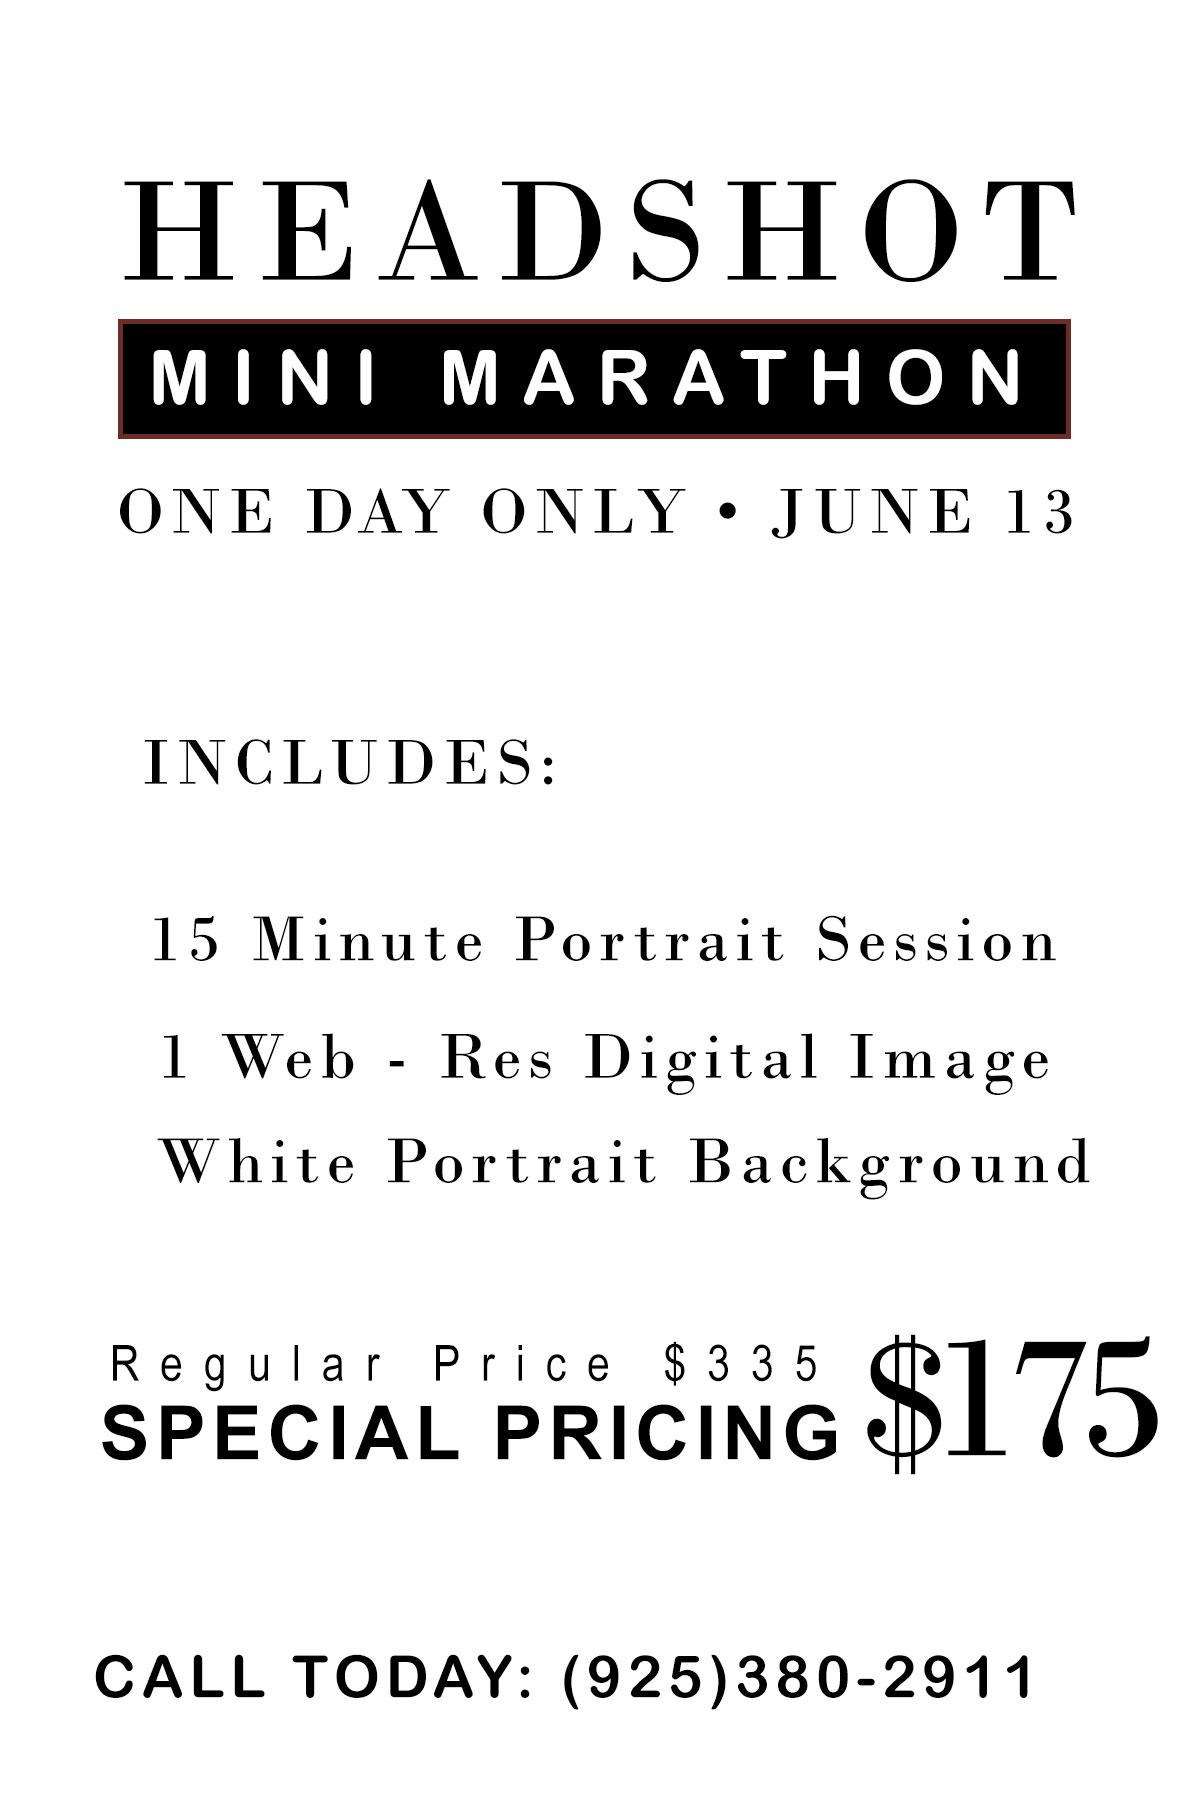 Headshot-Mini-Marathon